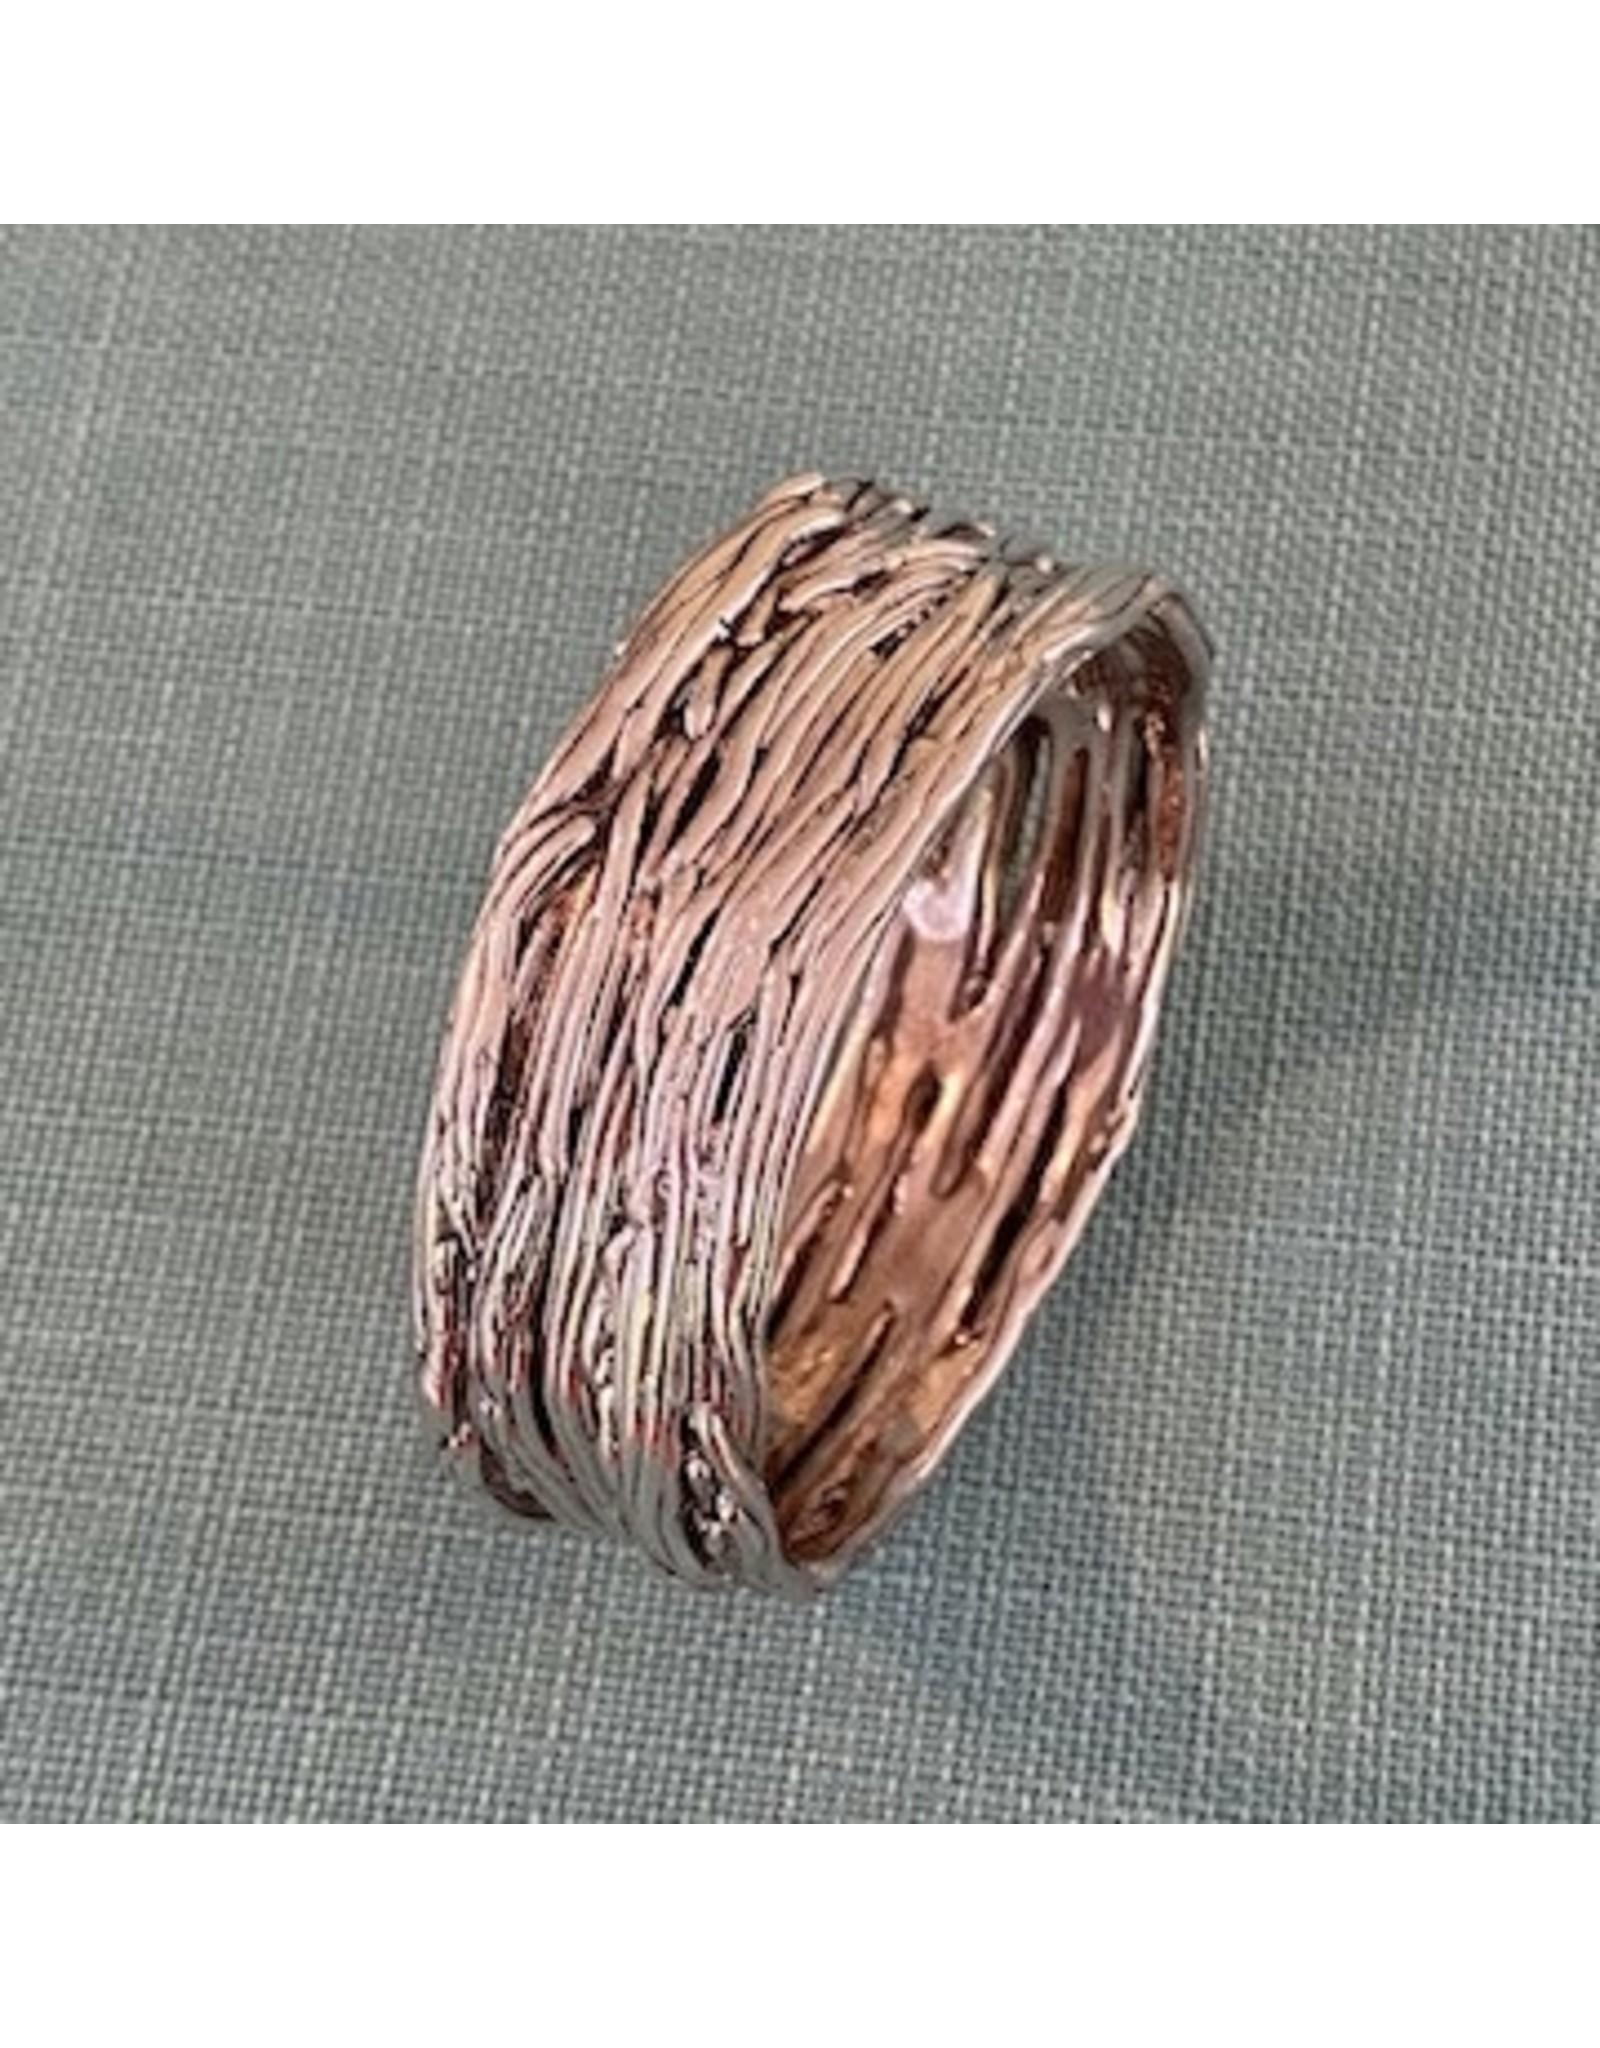 VC Exclusives Silver Textured Bracelet